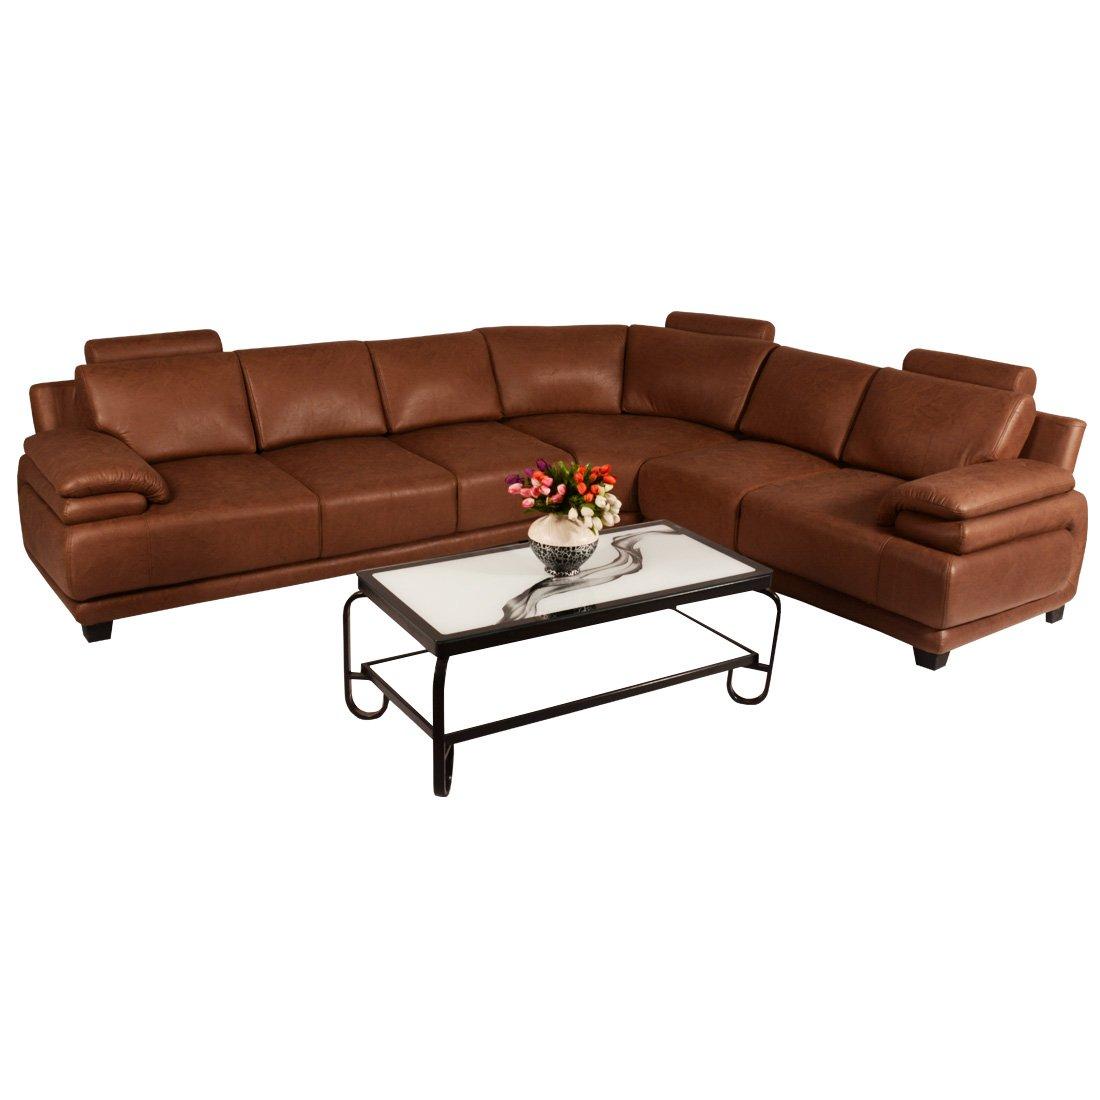 Superb Bharat Lifestyle Amaze Leatherette 6 Seater Finish Color Brown Machost Co Dining Chair Design Ideas Machostcouk